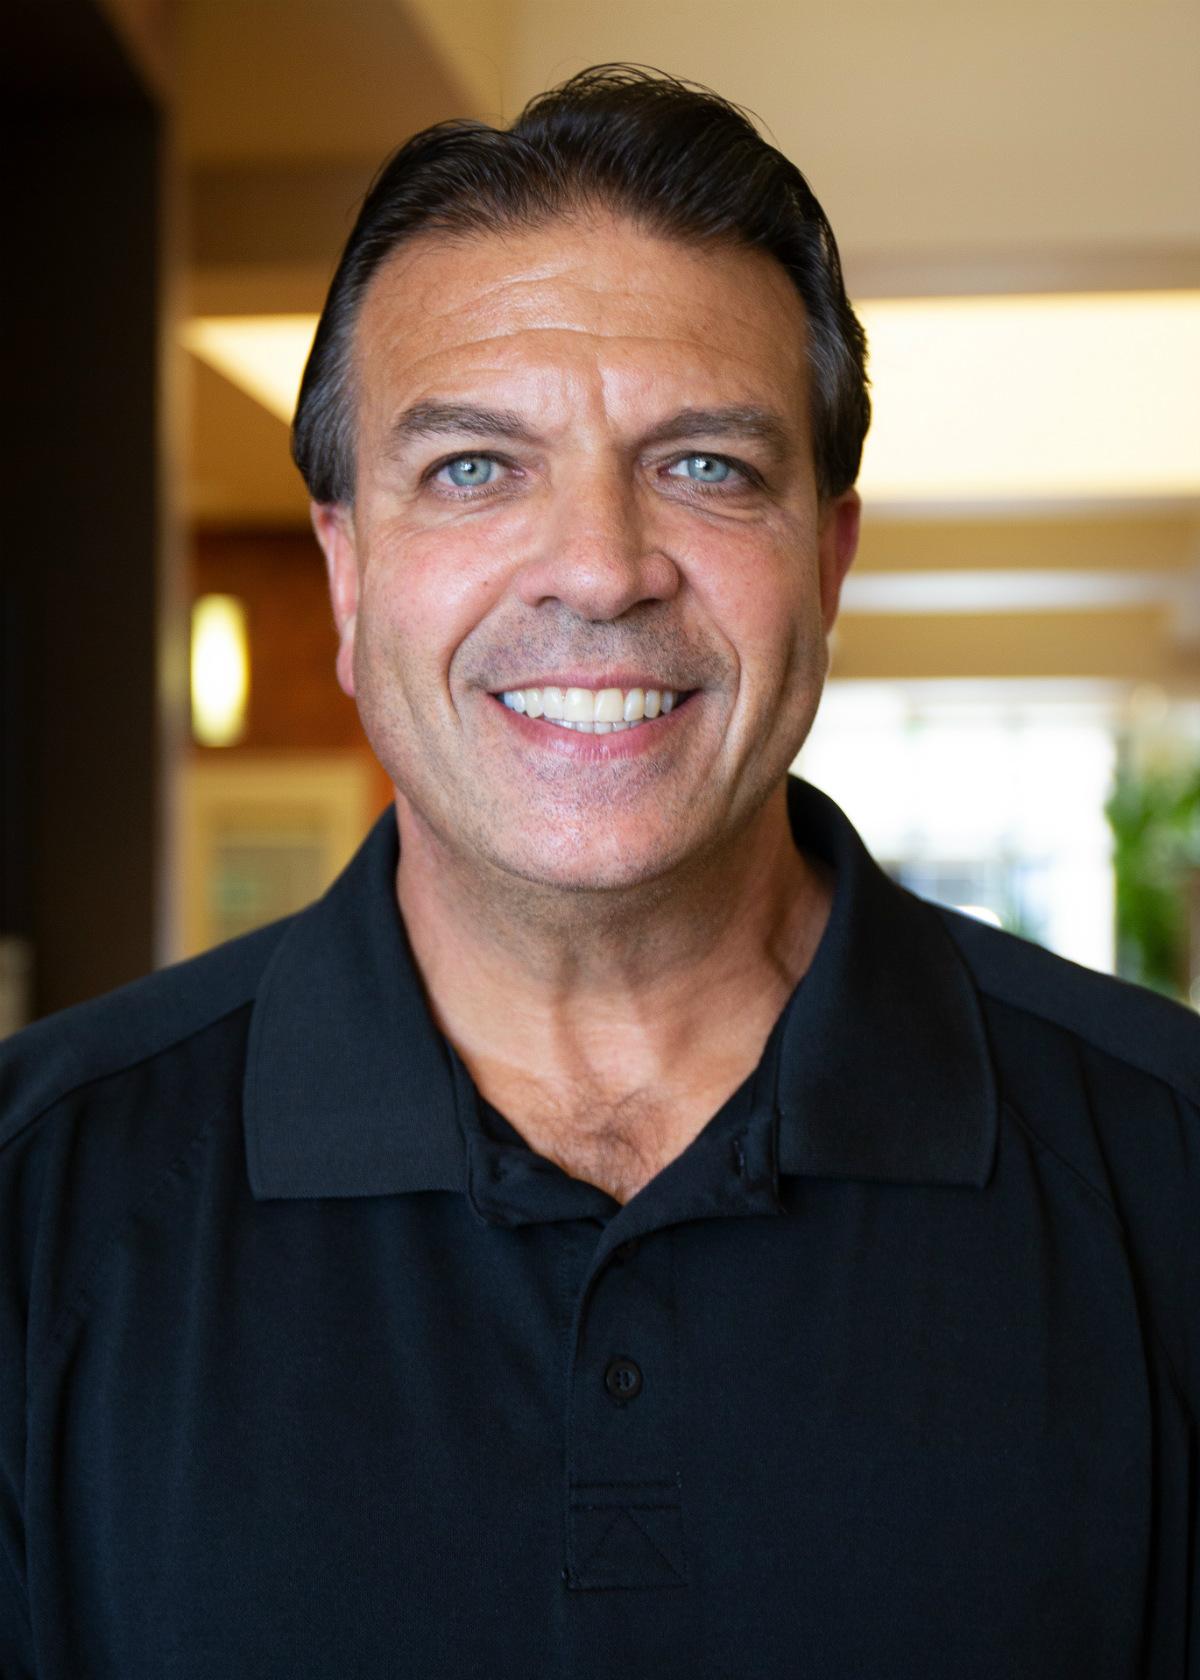 Paul Katson